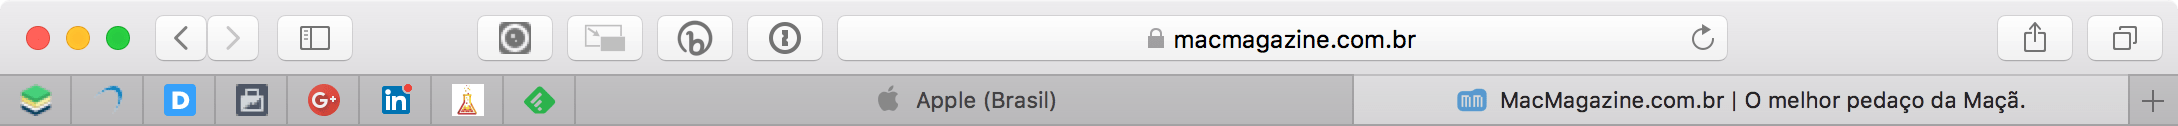 Favicons no Safari do macOS 10.14 Mojave